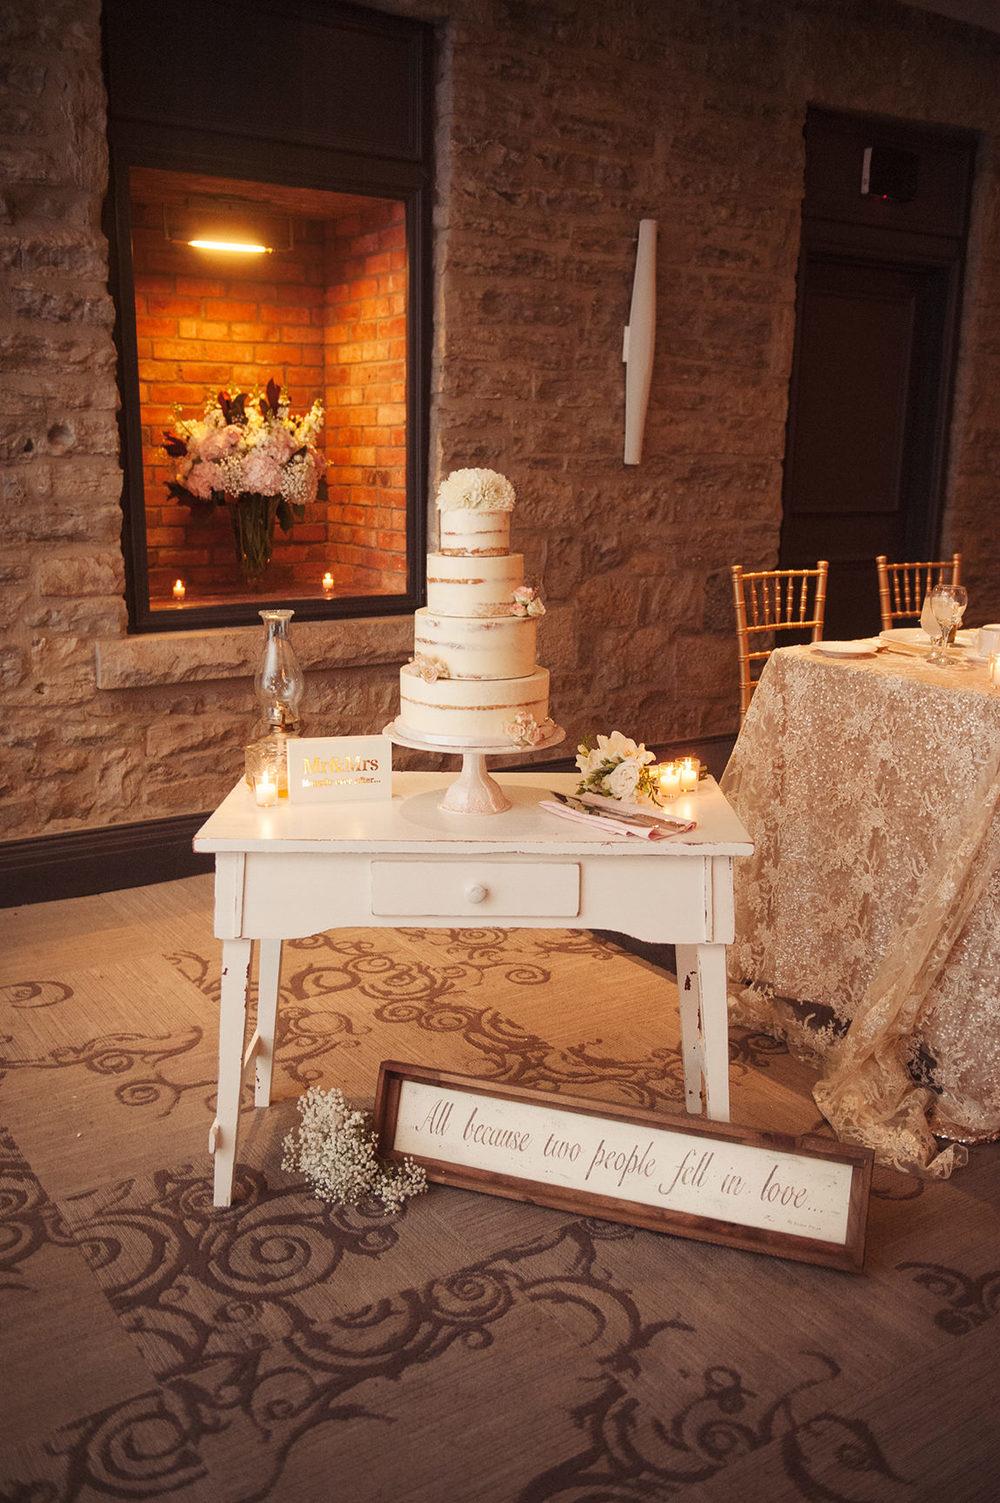 St-Catharines-Wedding-Stone-Mill-Inn-Amy-Darryl-photography-by-Morgan-Falk-075.JPG